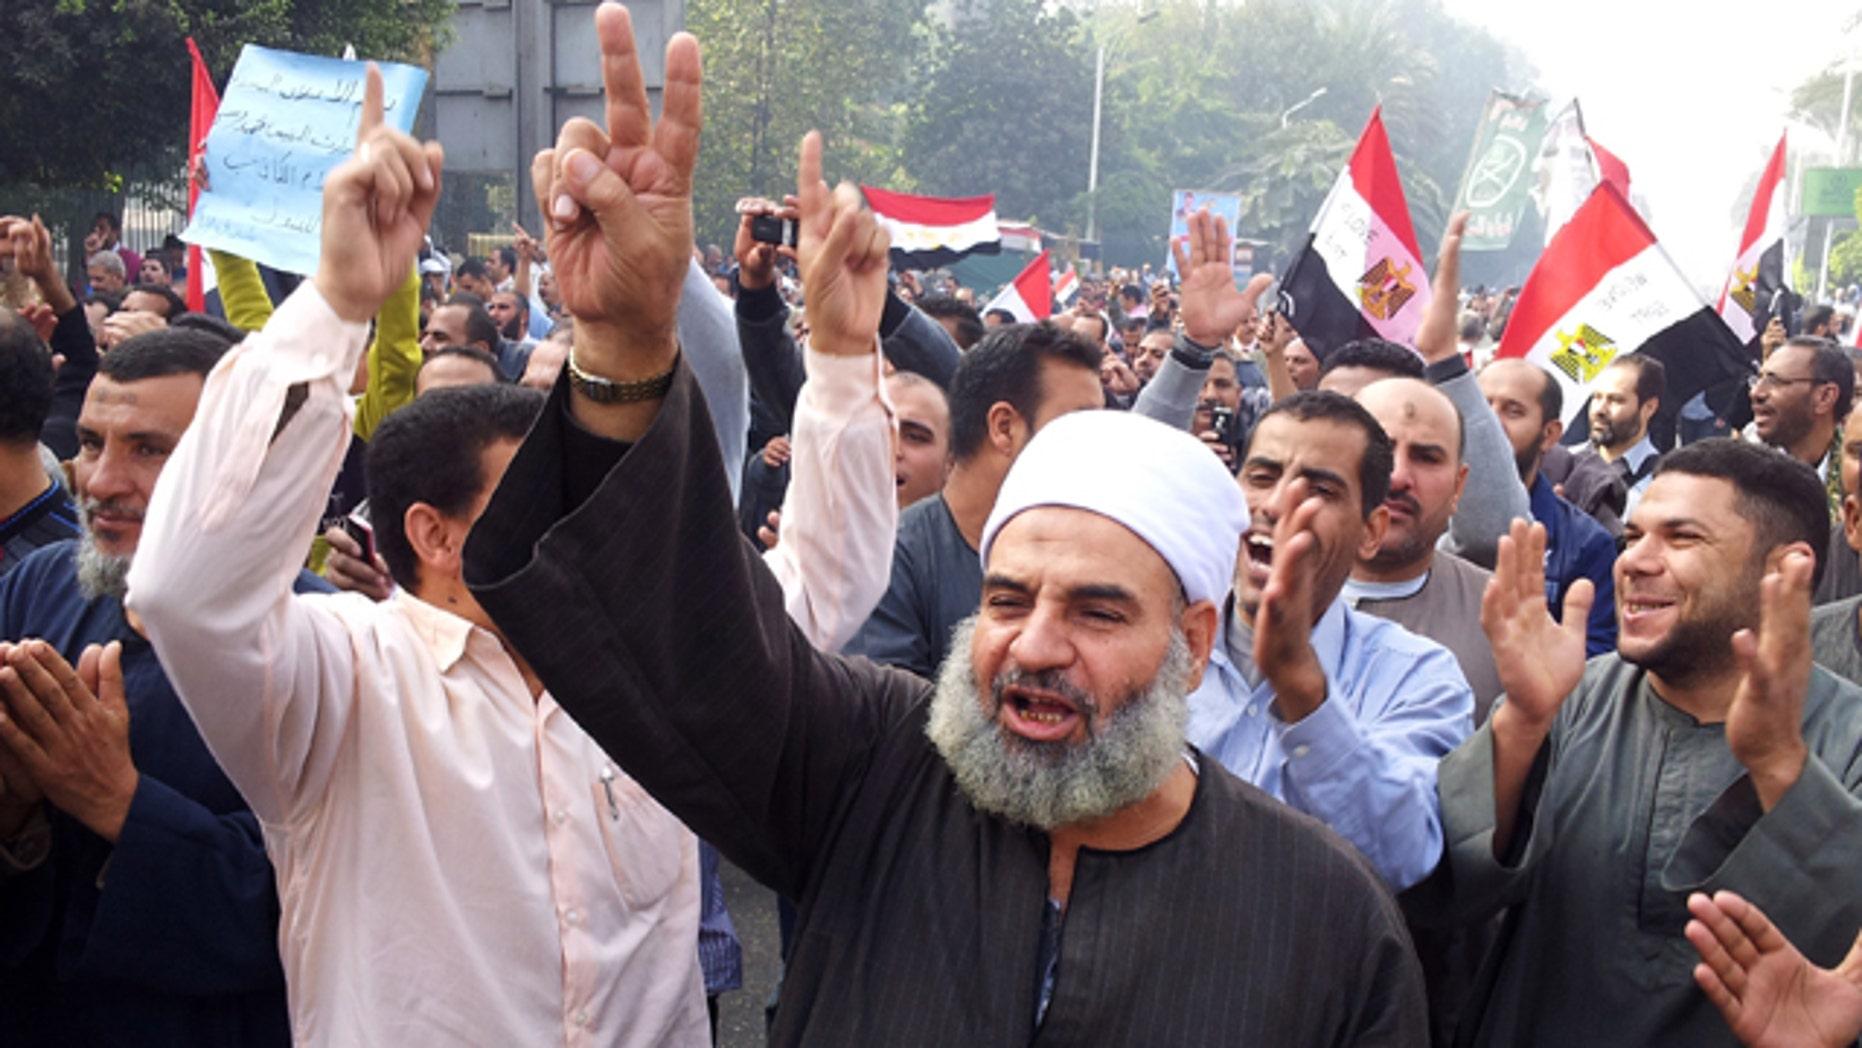 Supporters of Egyptian President Mohammed Morsi march in Cairo, Egypt.